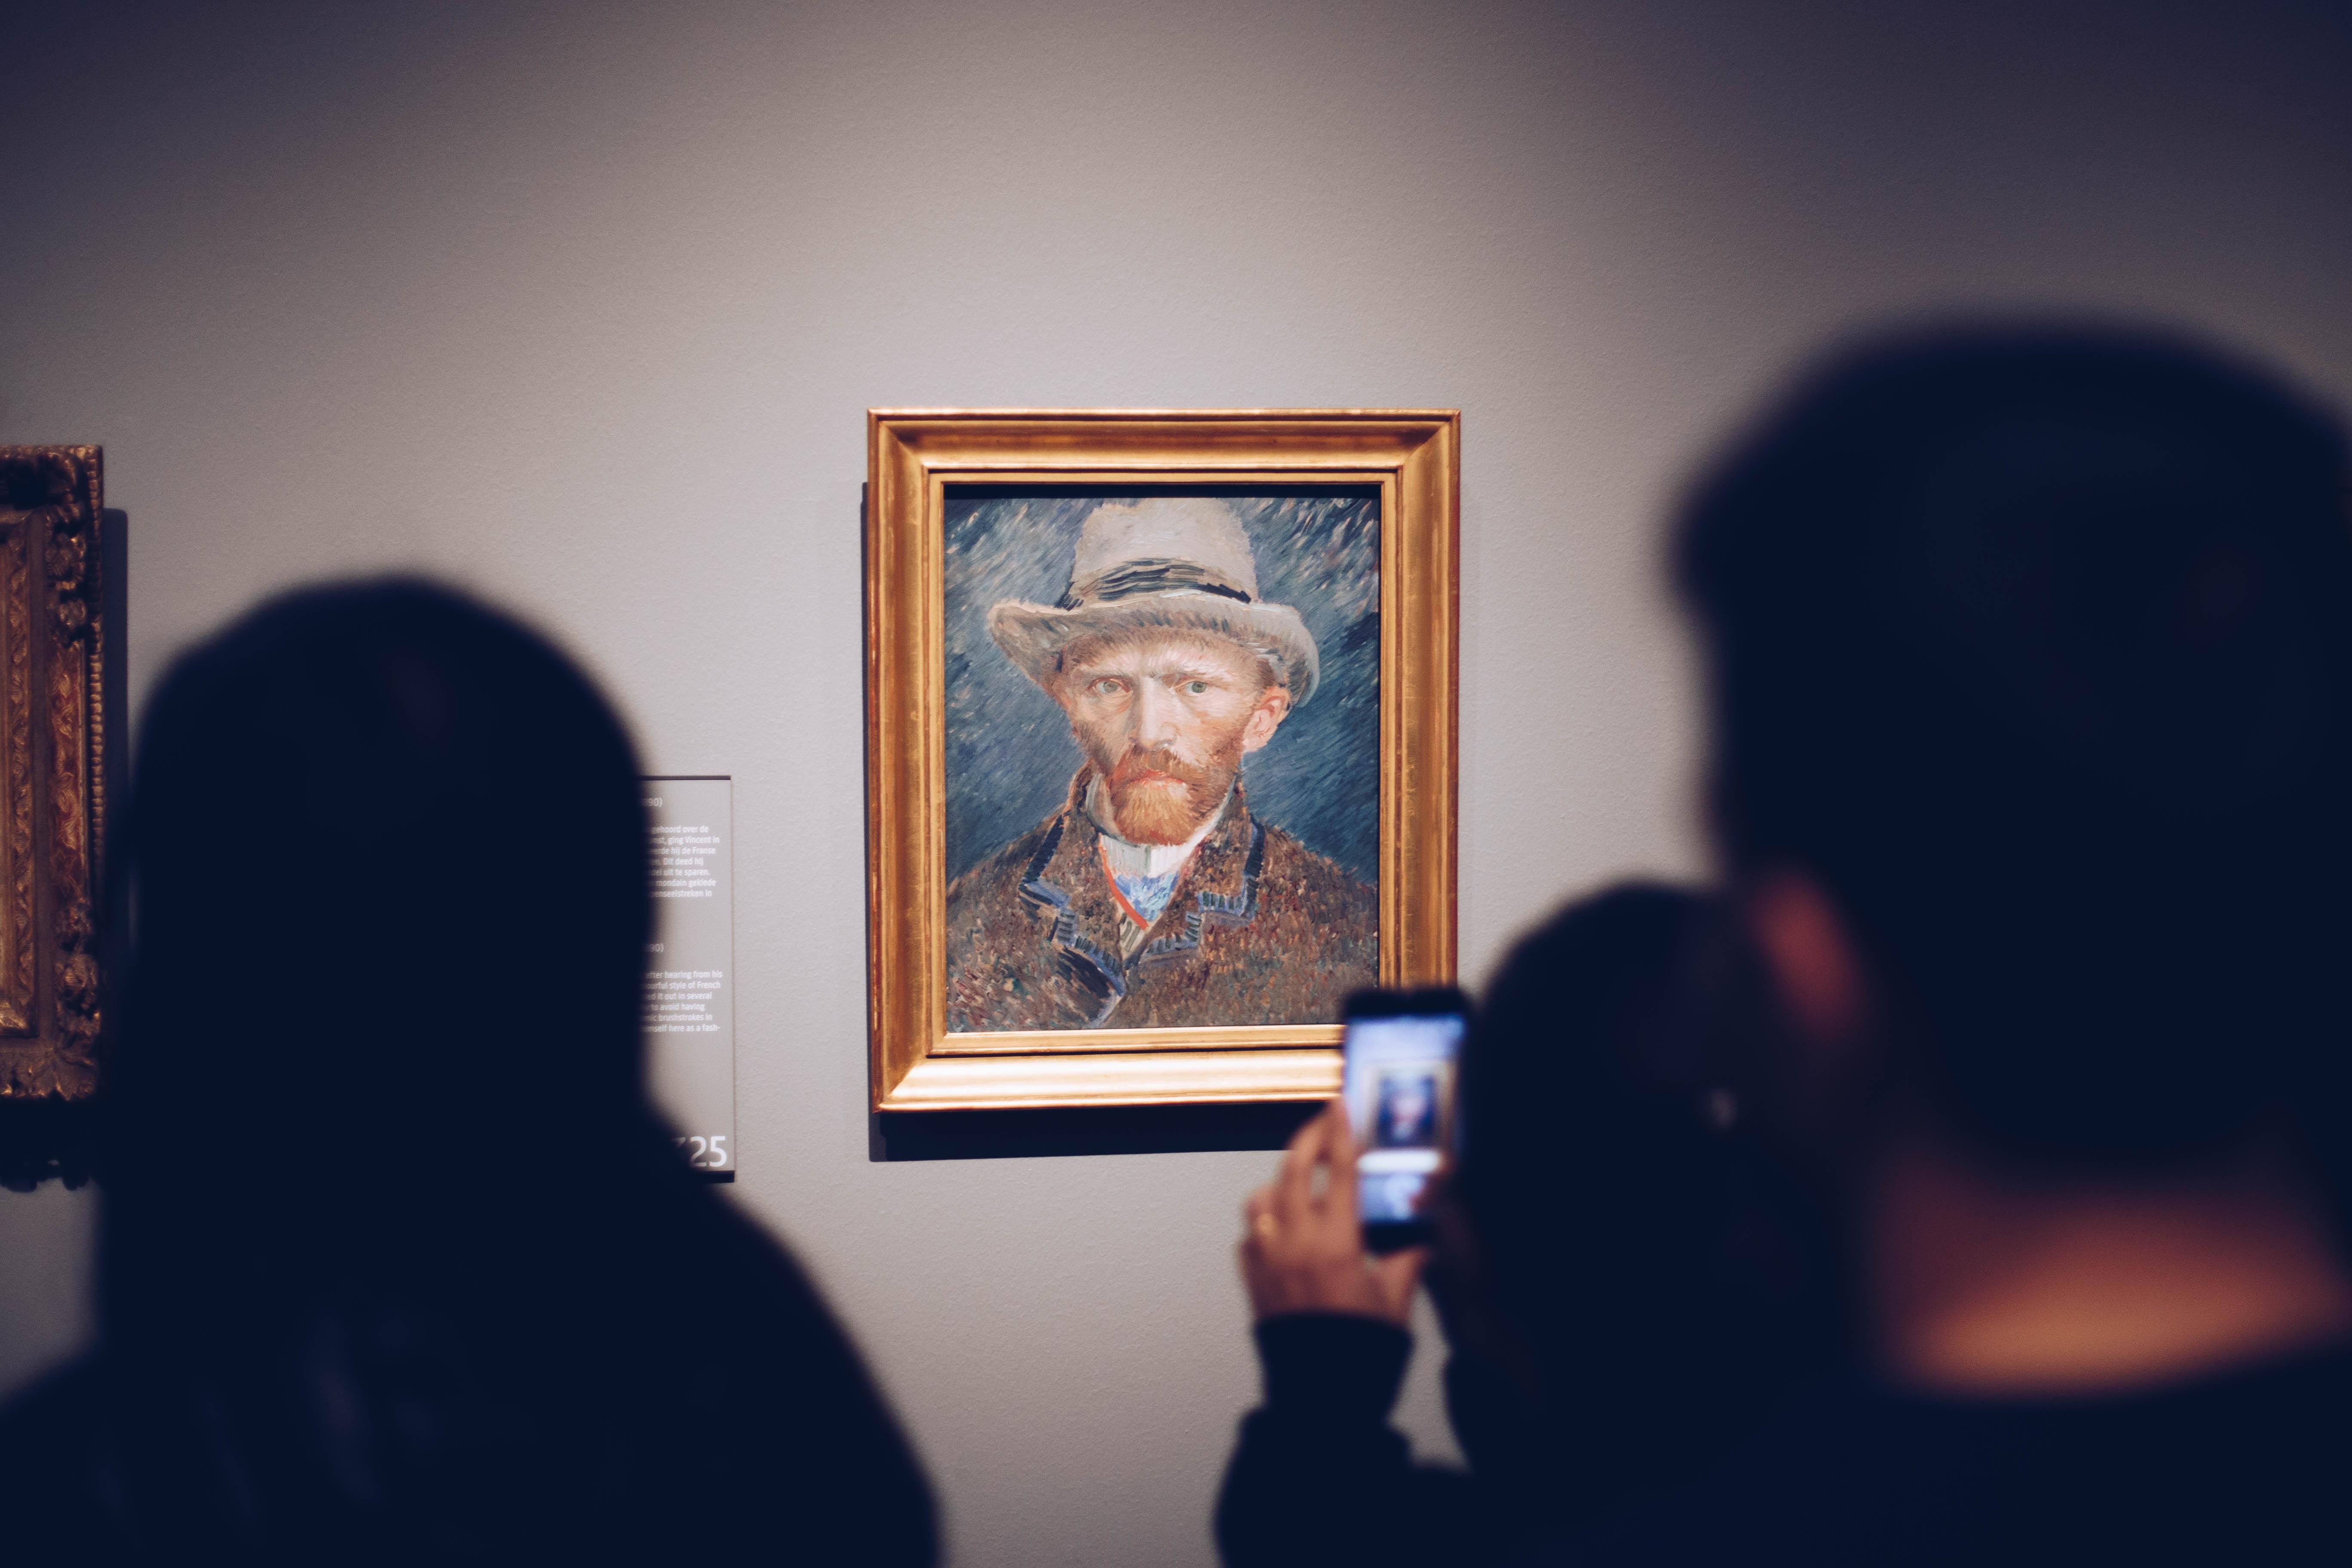 Van Gogh in a frame